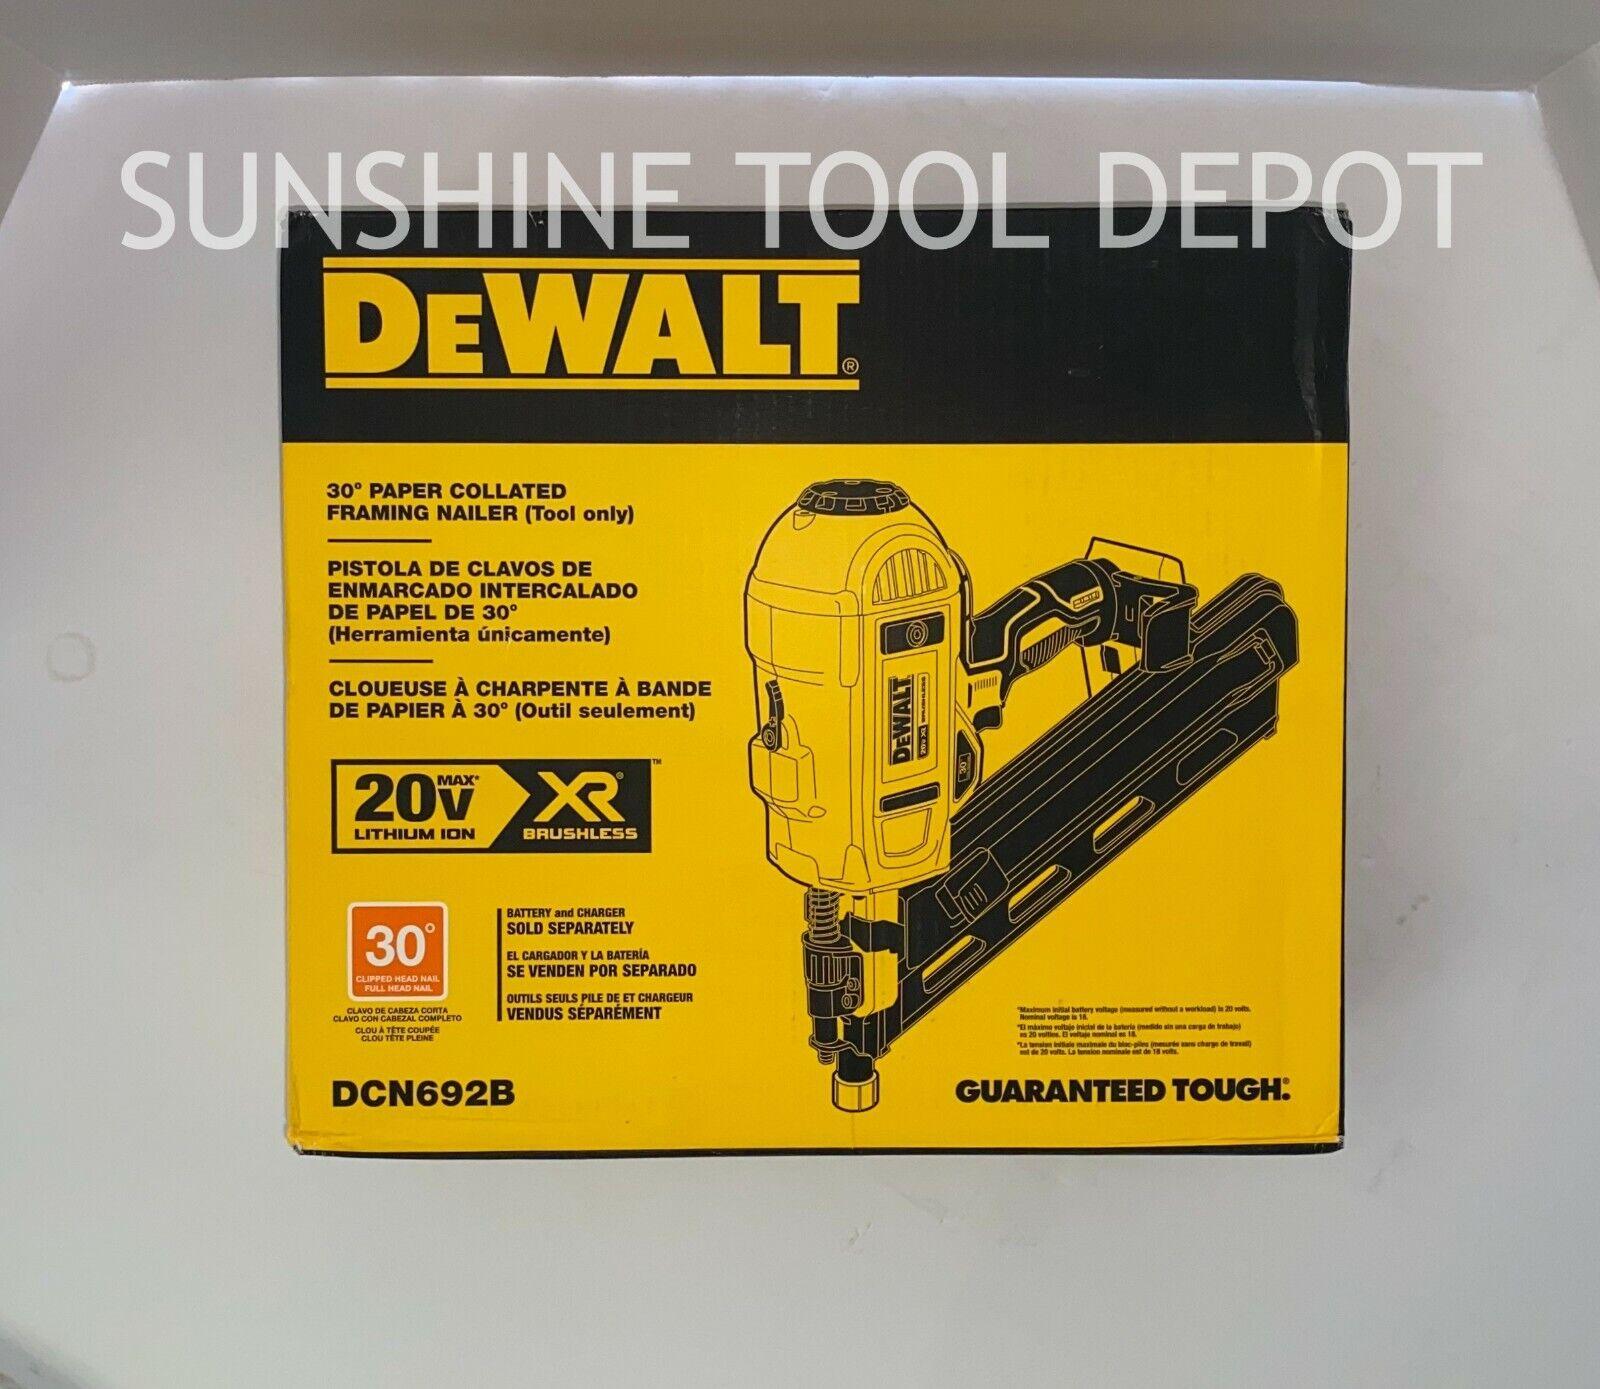 DeWalt DCN692B 20V MAX Cordless 30° Paper Collated Framing Nailer